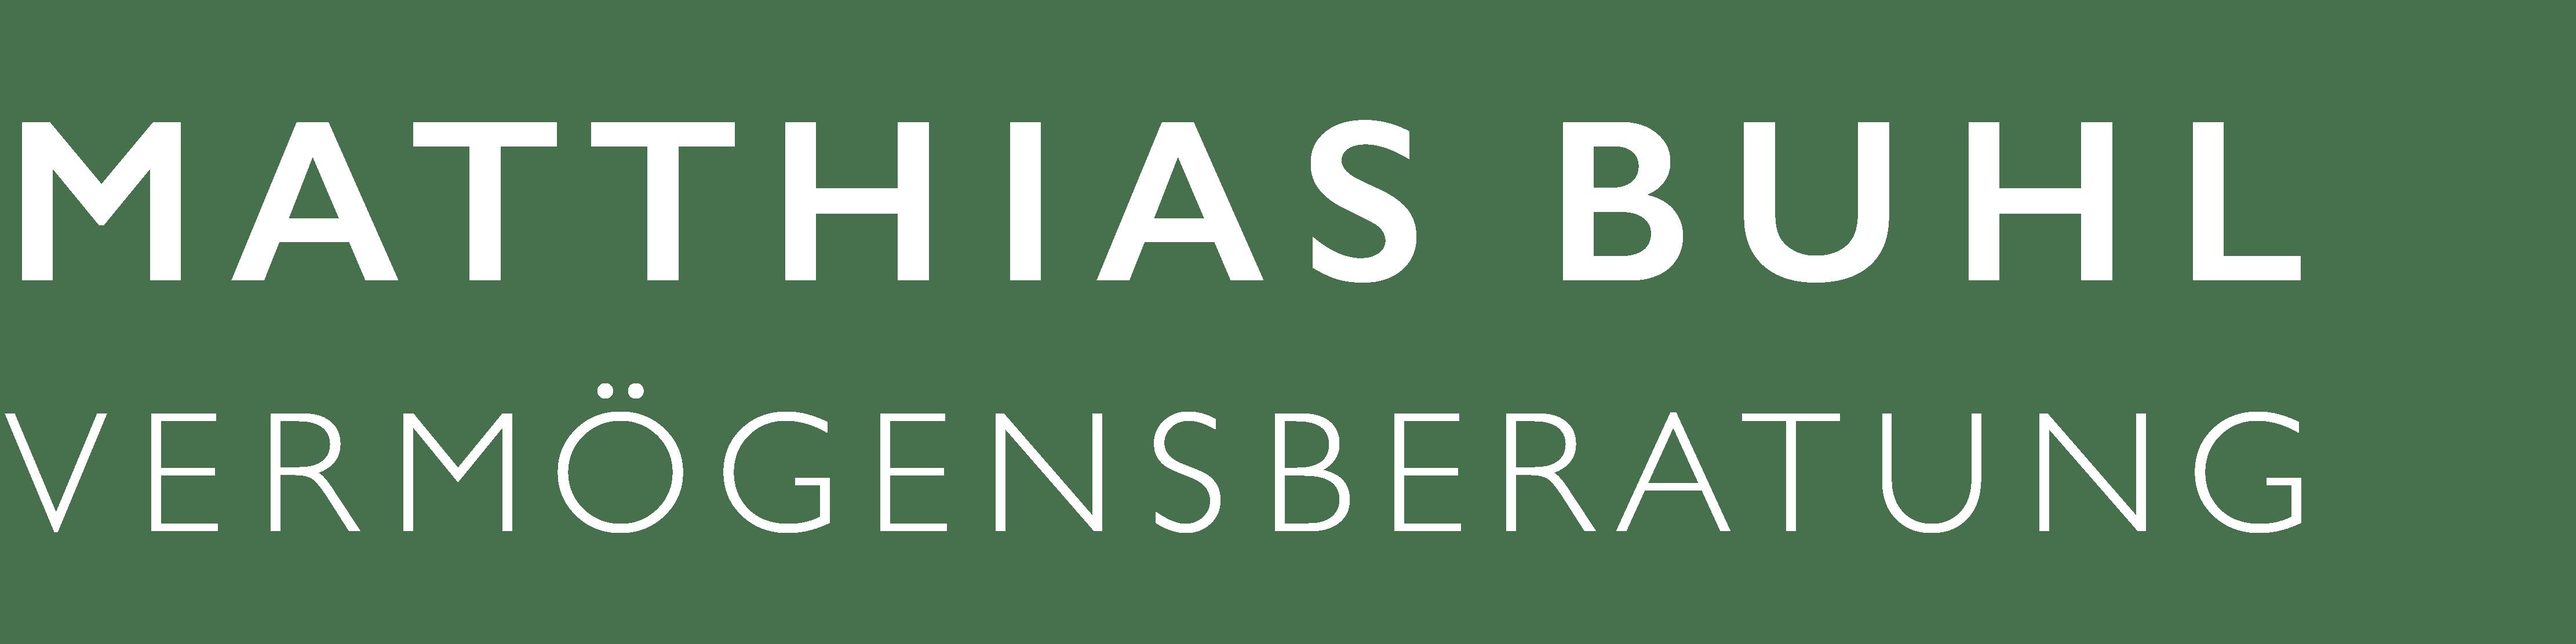 MATTHIAS BUHL - VERMÖGENSBERATUNG